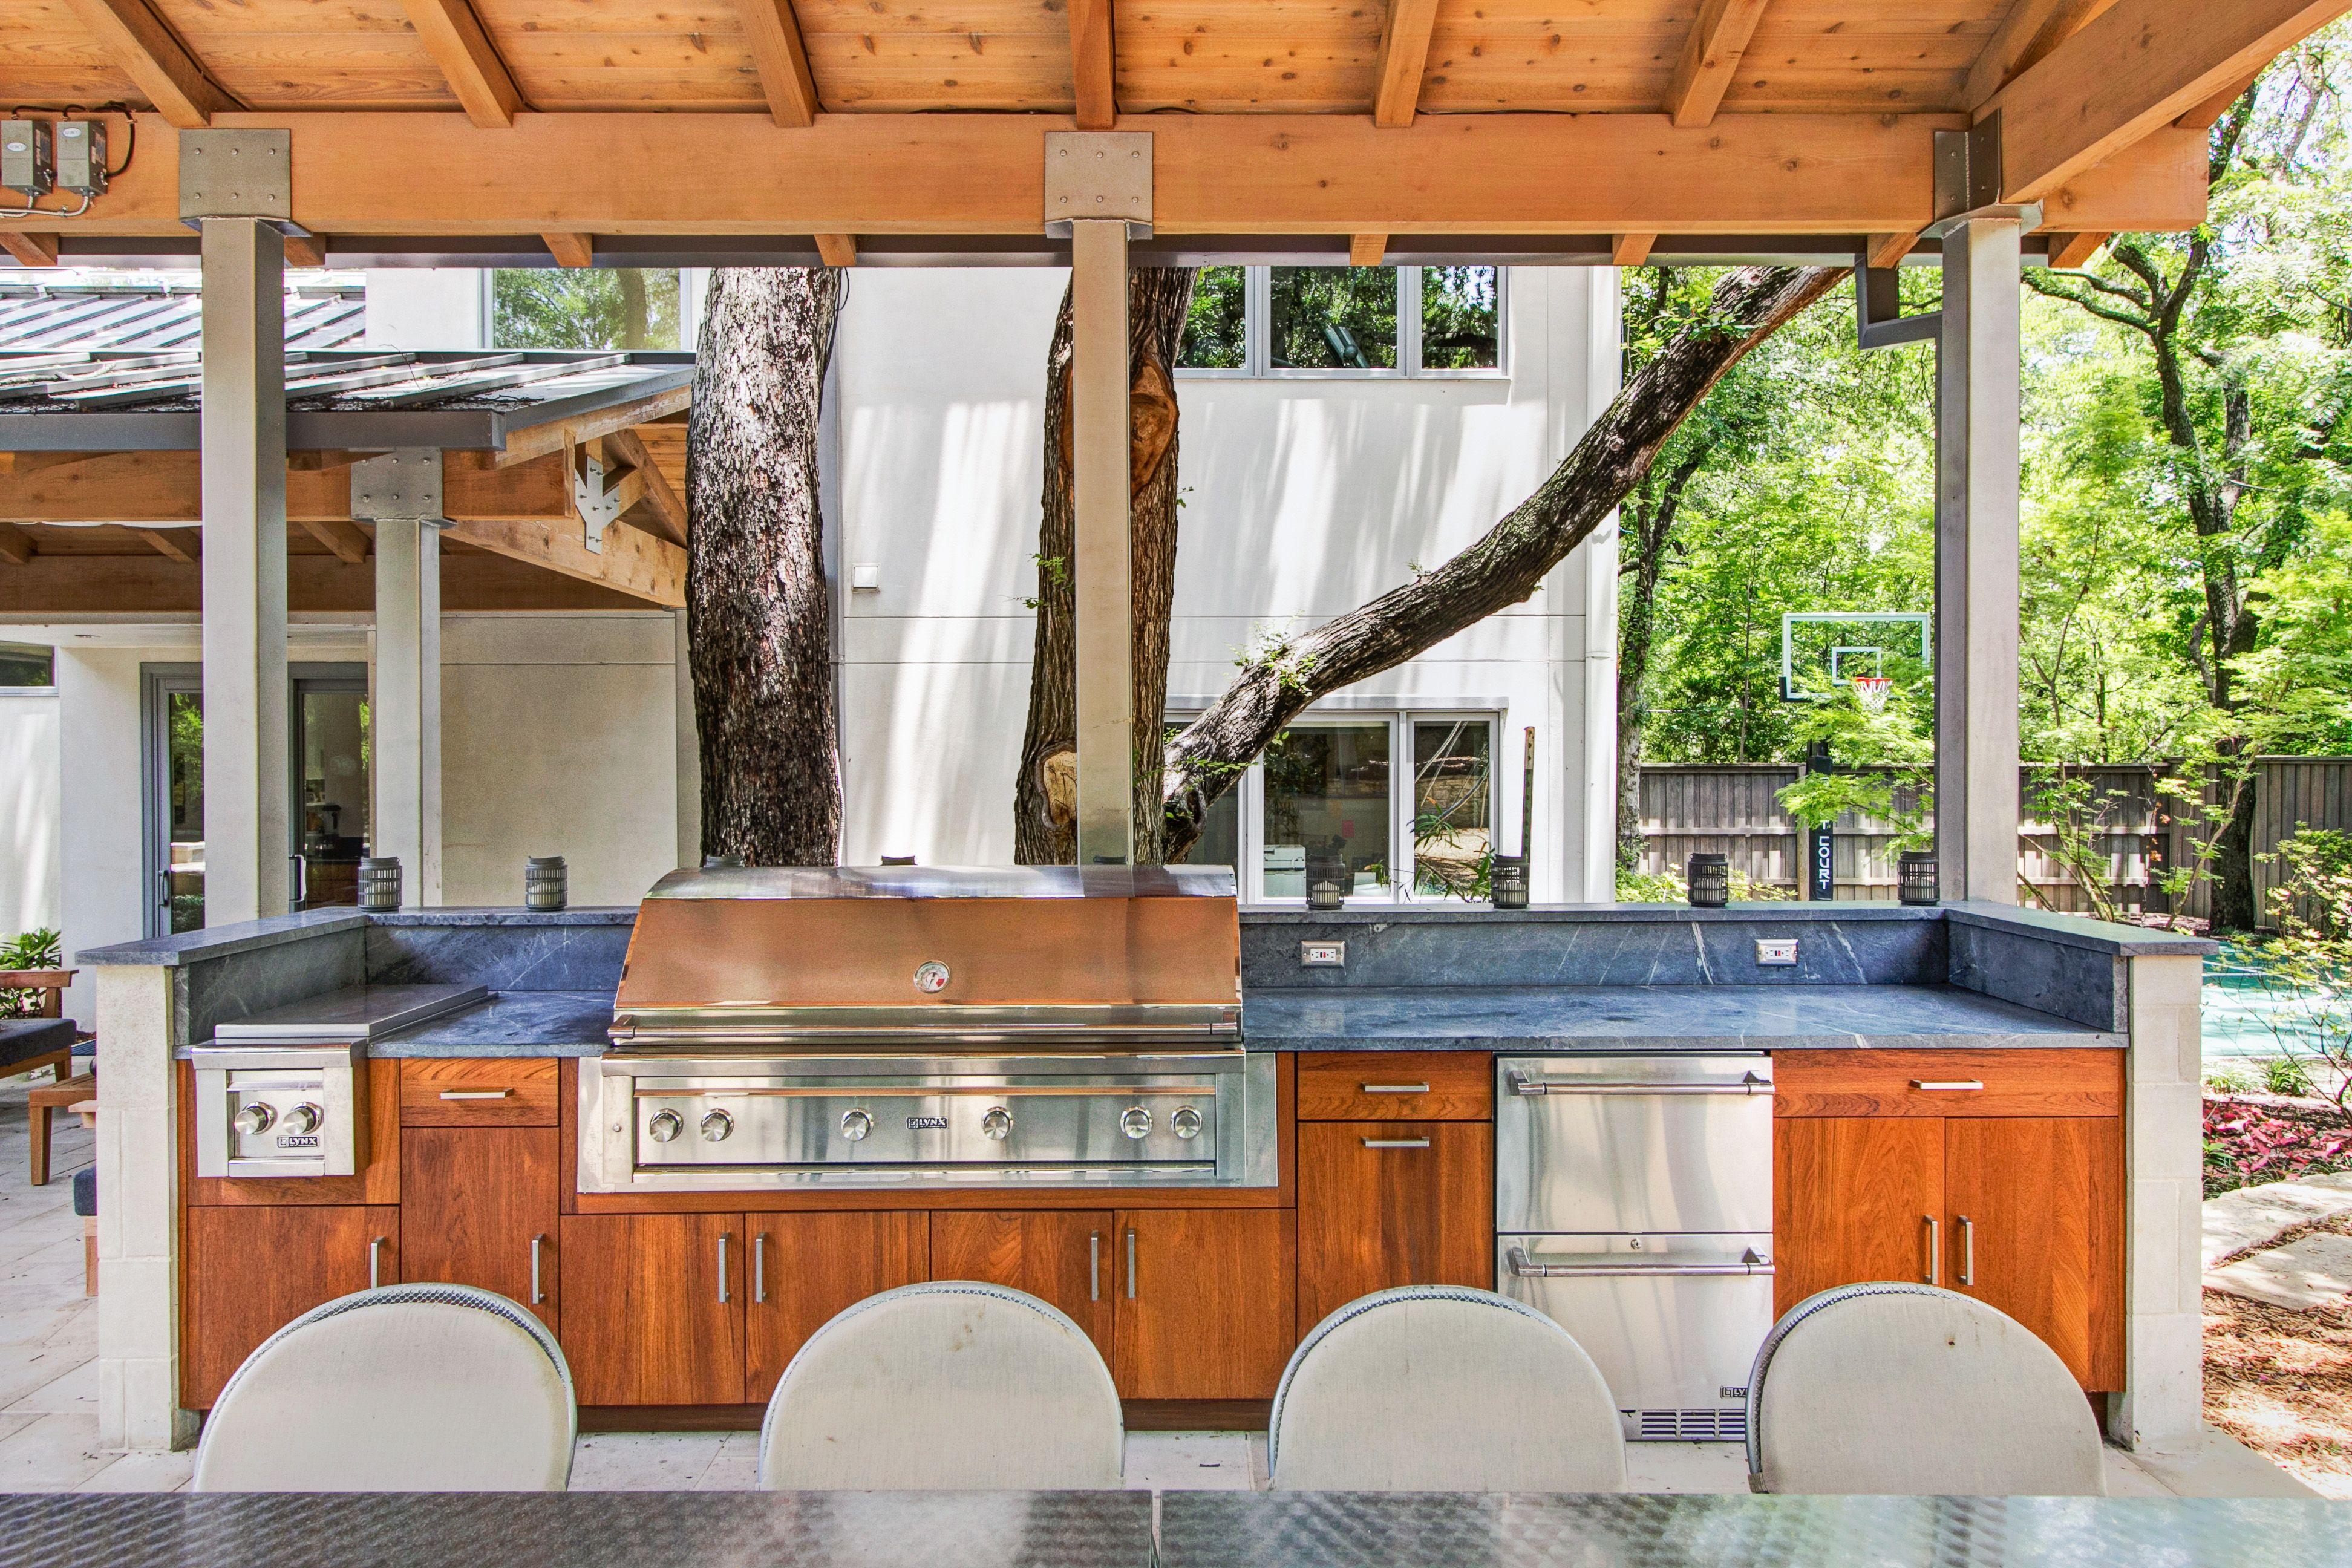 Teak Cabinets With Slab Door Lynx 54 Grill Double Side Burner And Drawer Fridge North Dallas Wildwood Outdoor Kitchen Design Kitchen